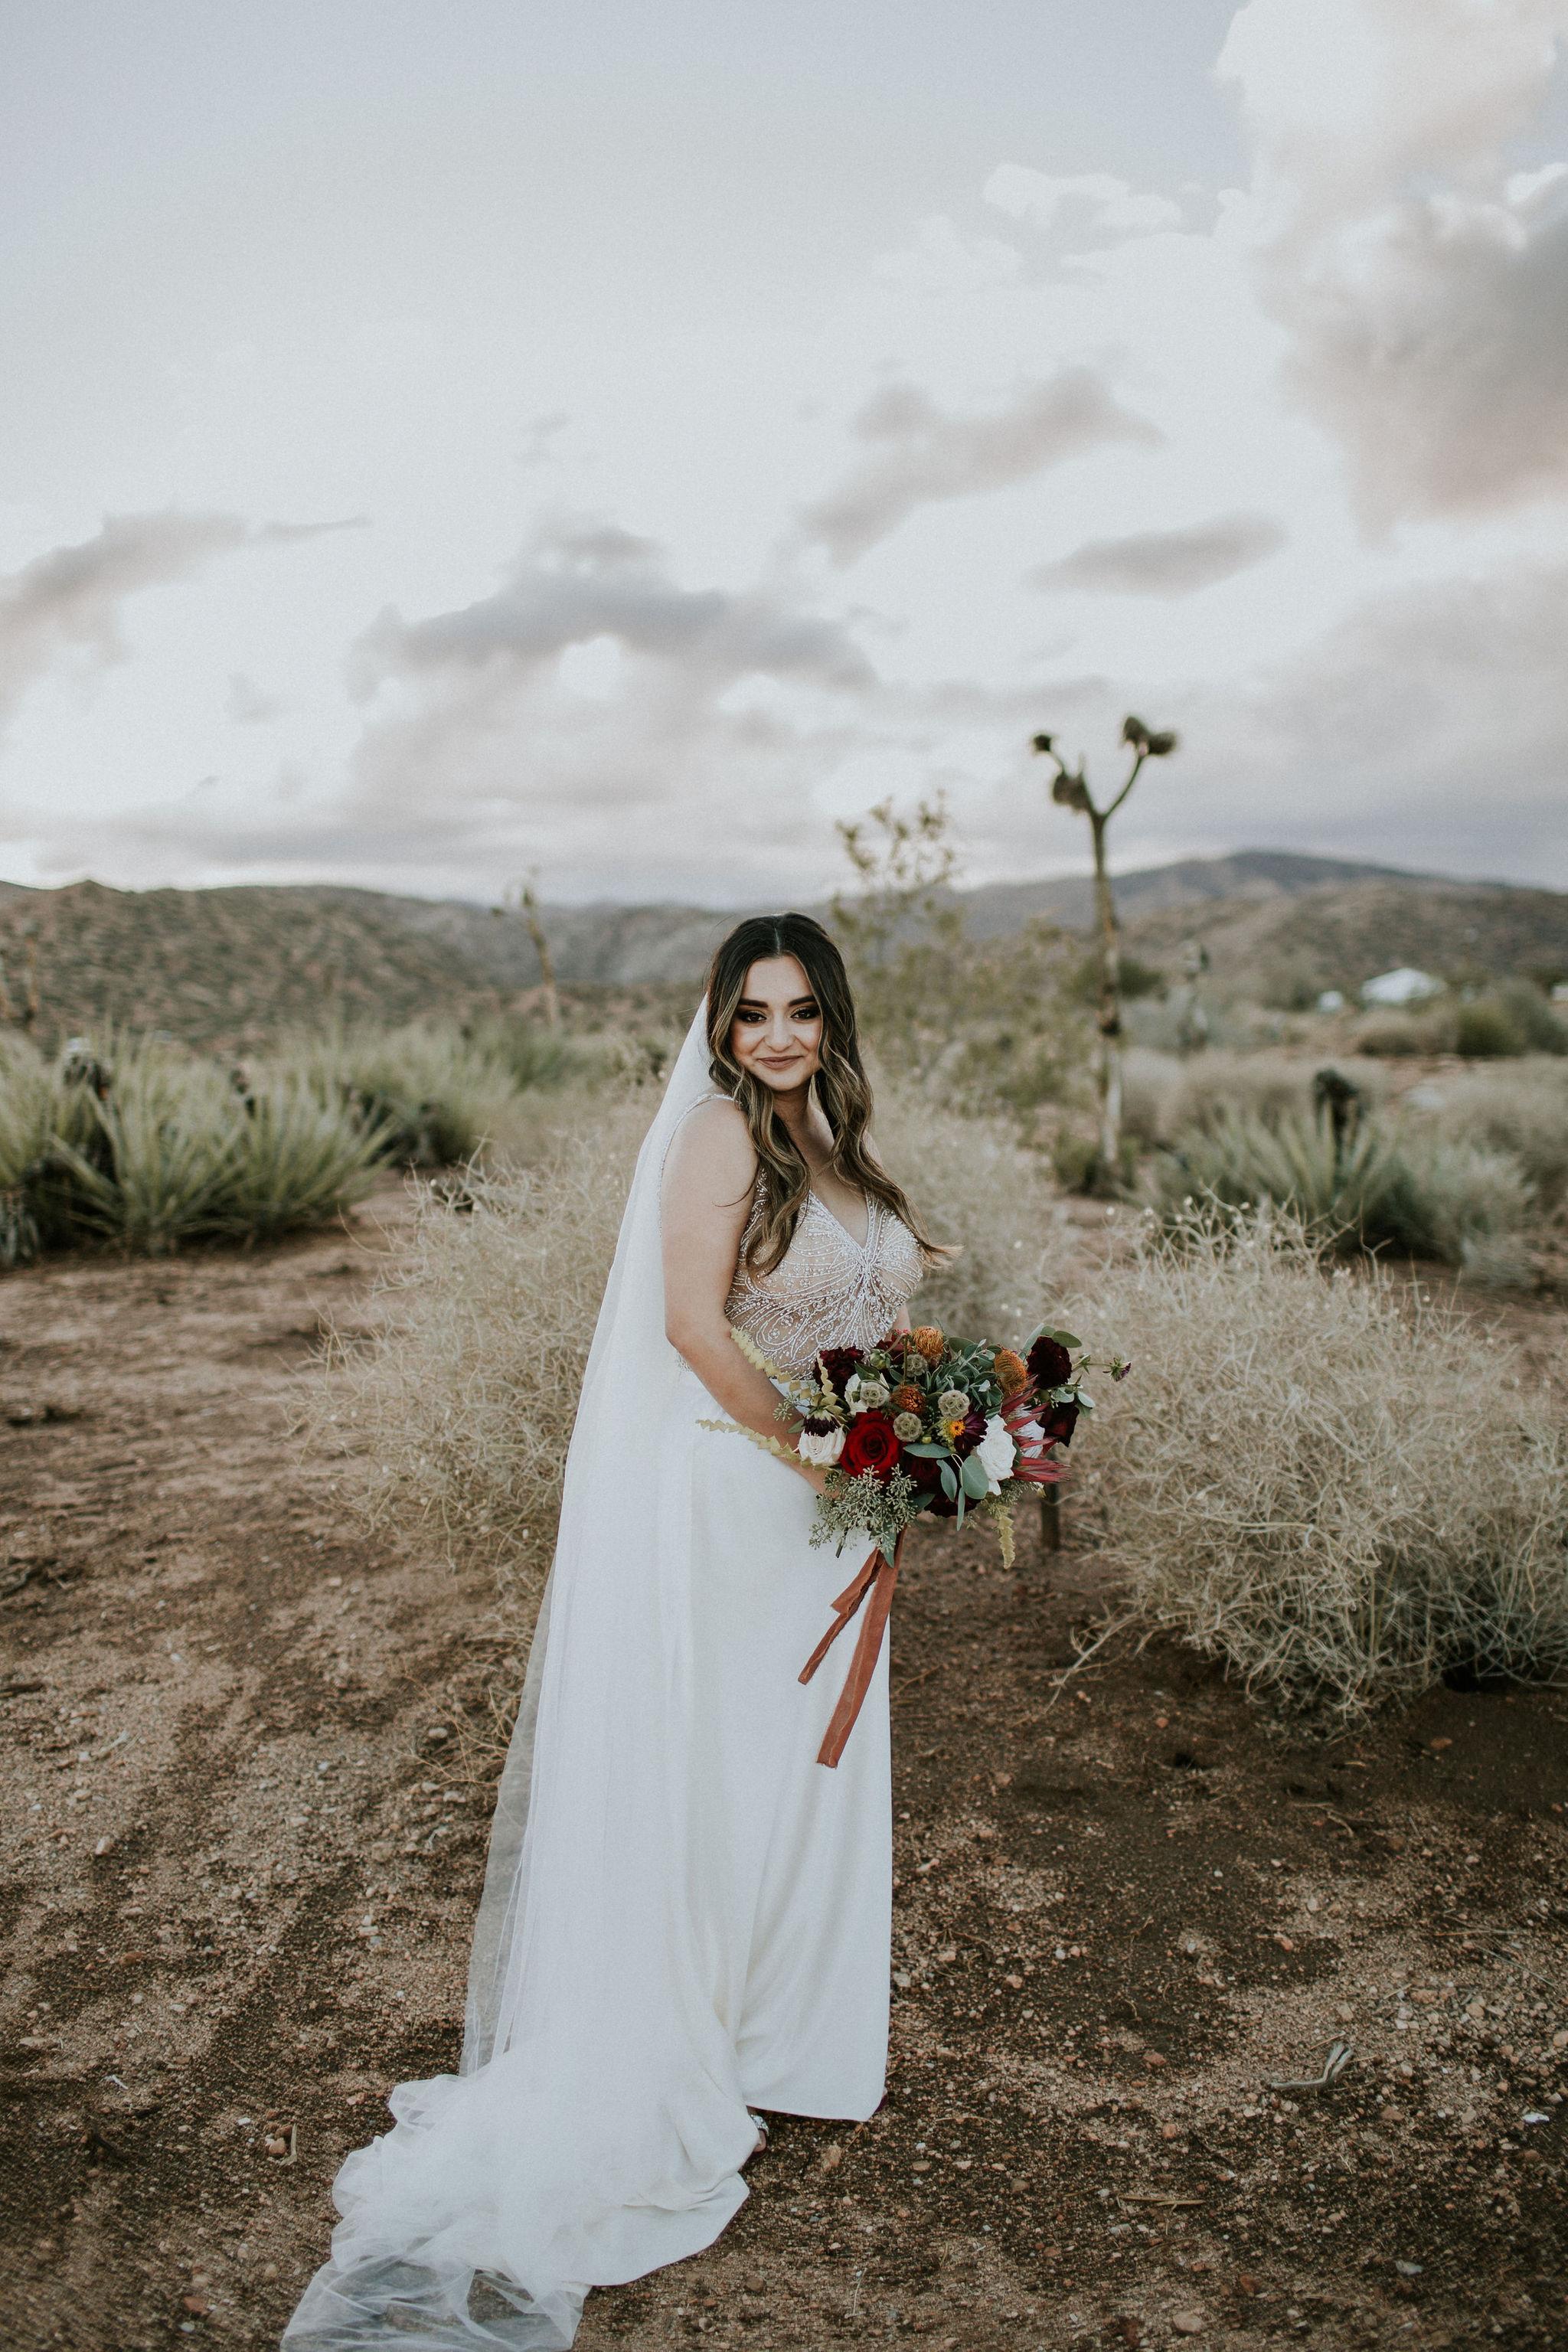 RimrockRanch-JoshuaTree-Wedding-Jami-Laree-677.jpg